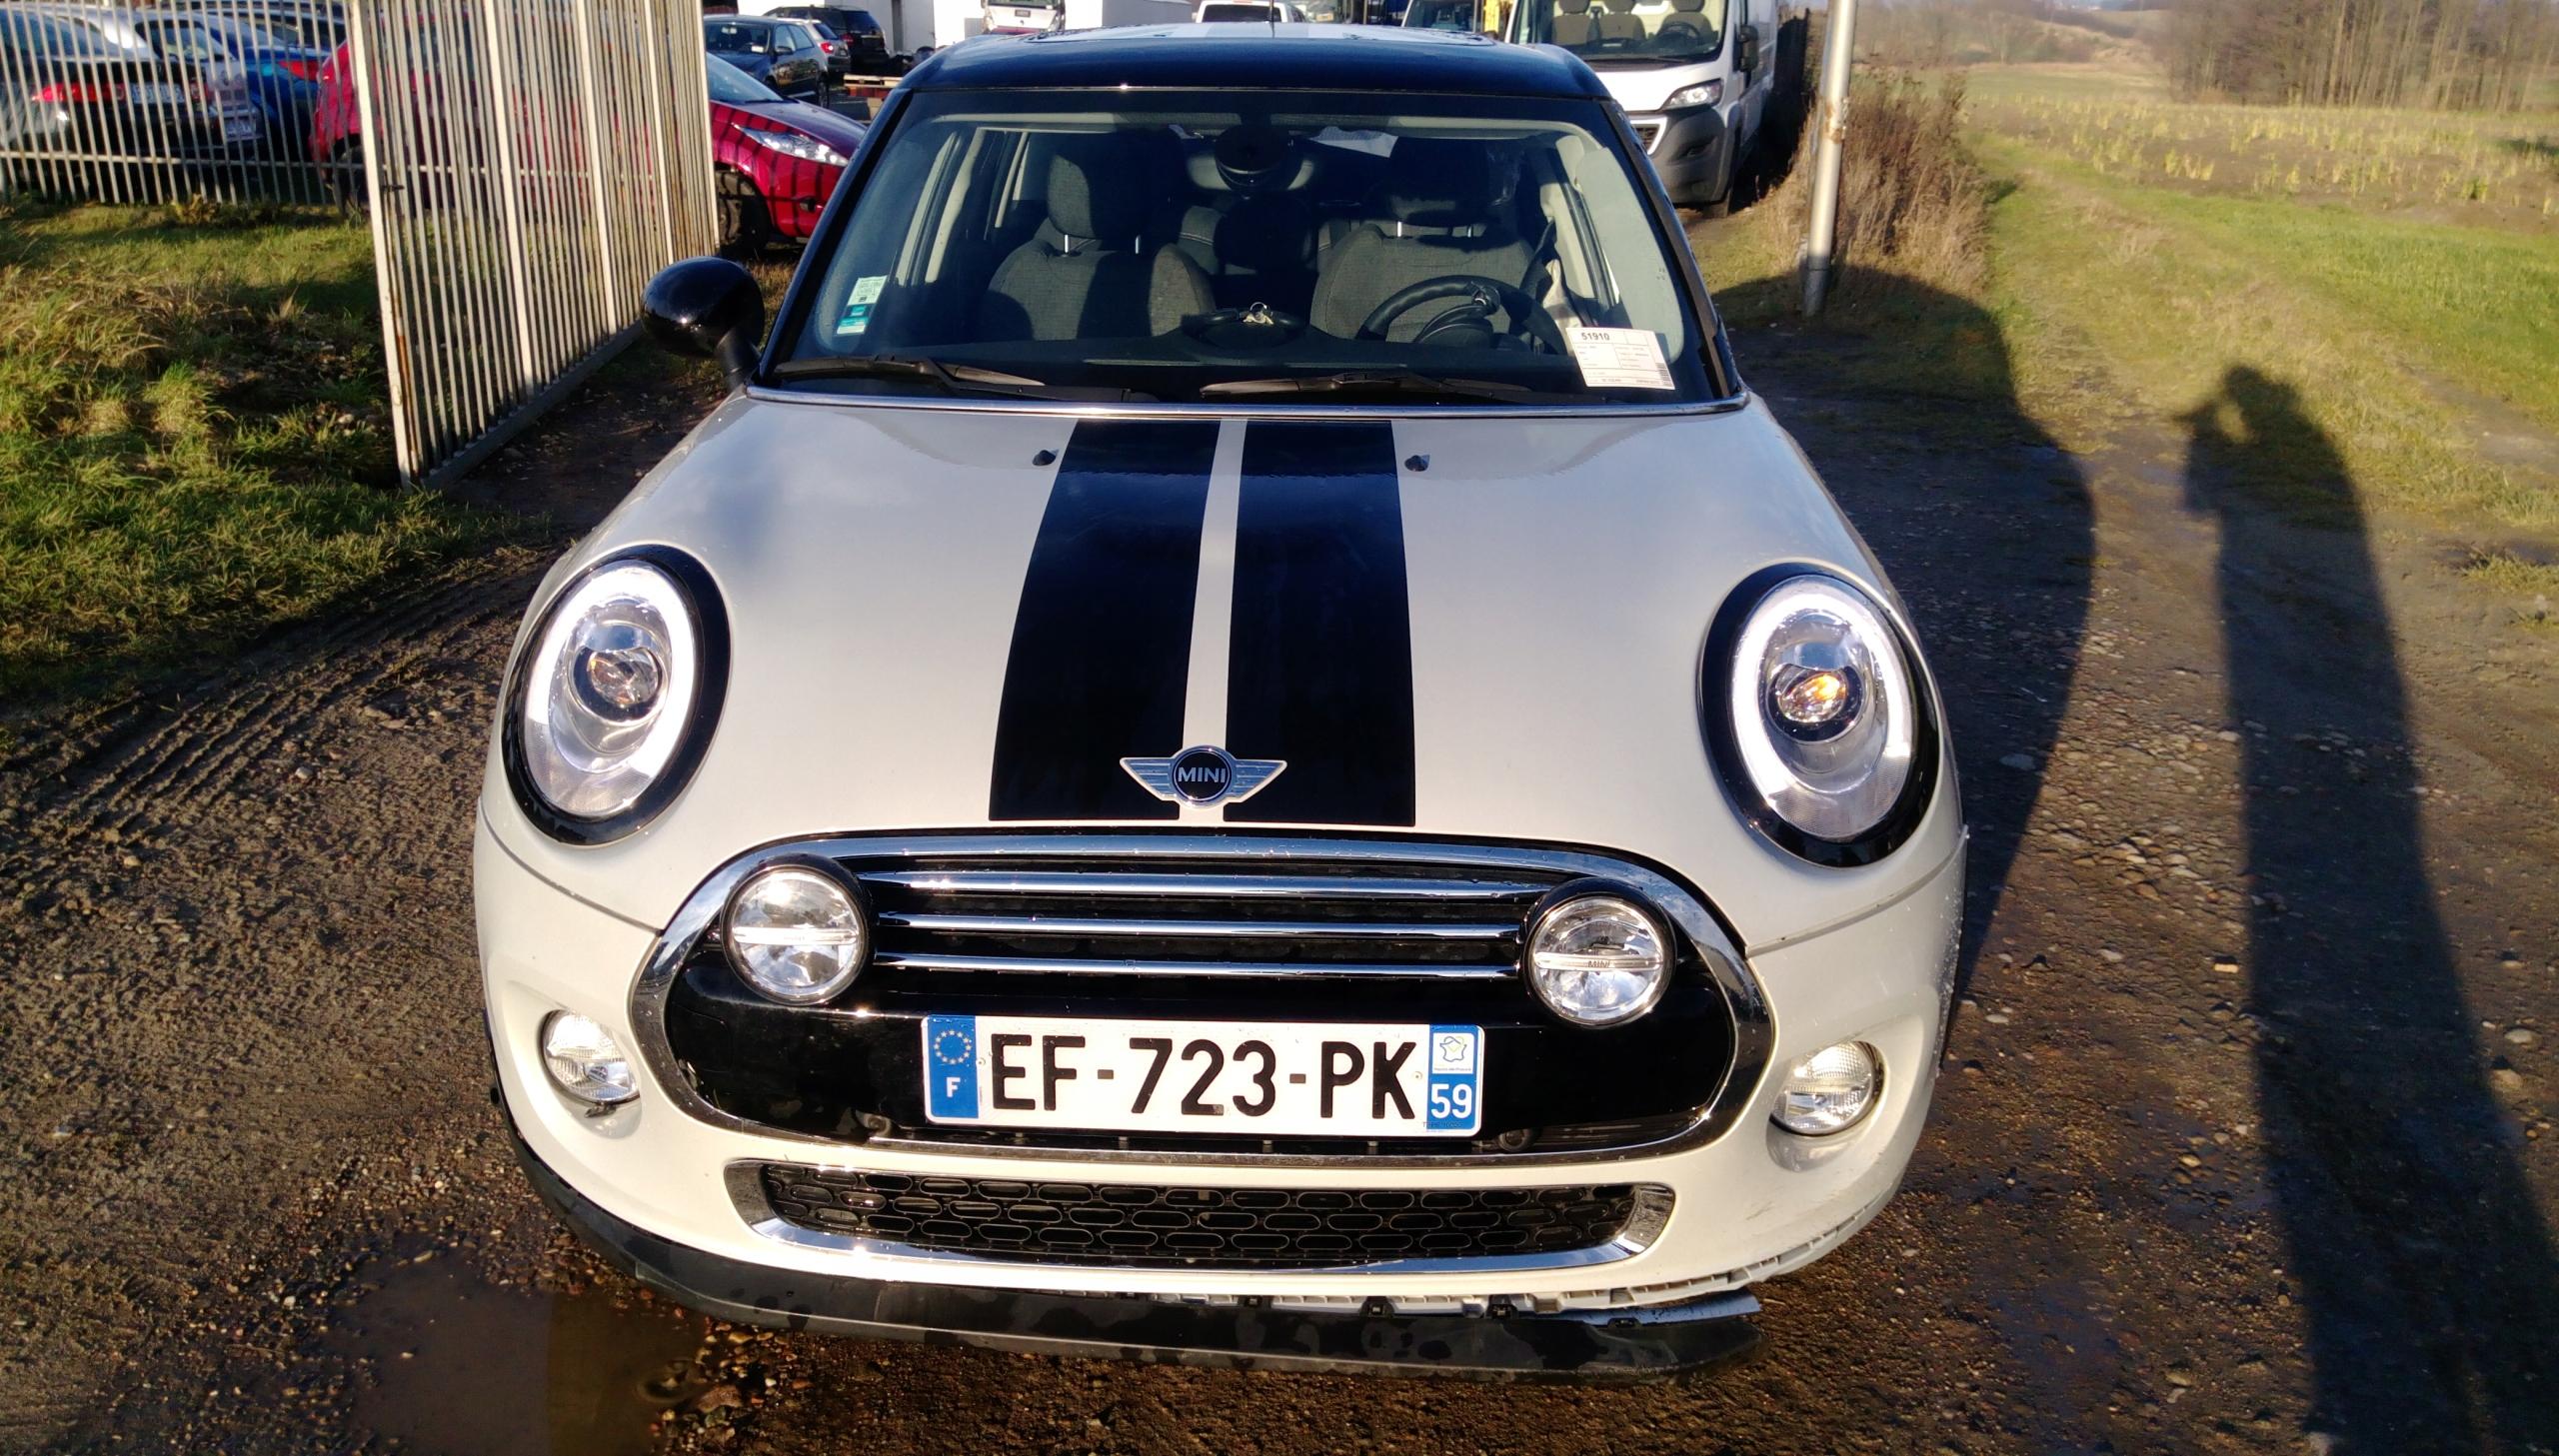 Mini Cooper D 15 Diesel Euro 6 2016 Panorama Dach 7537852527